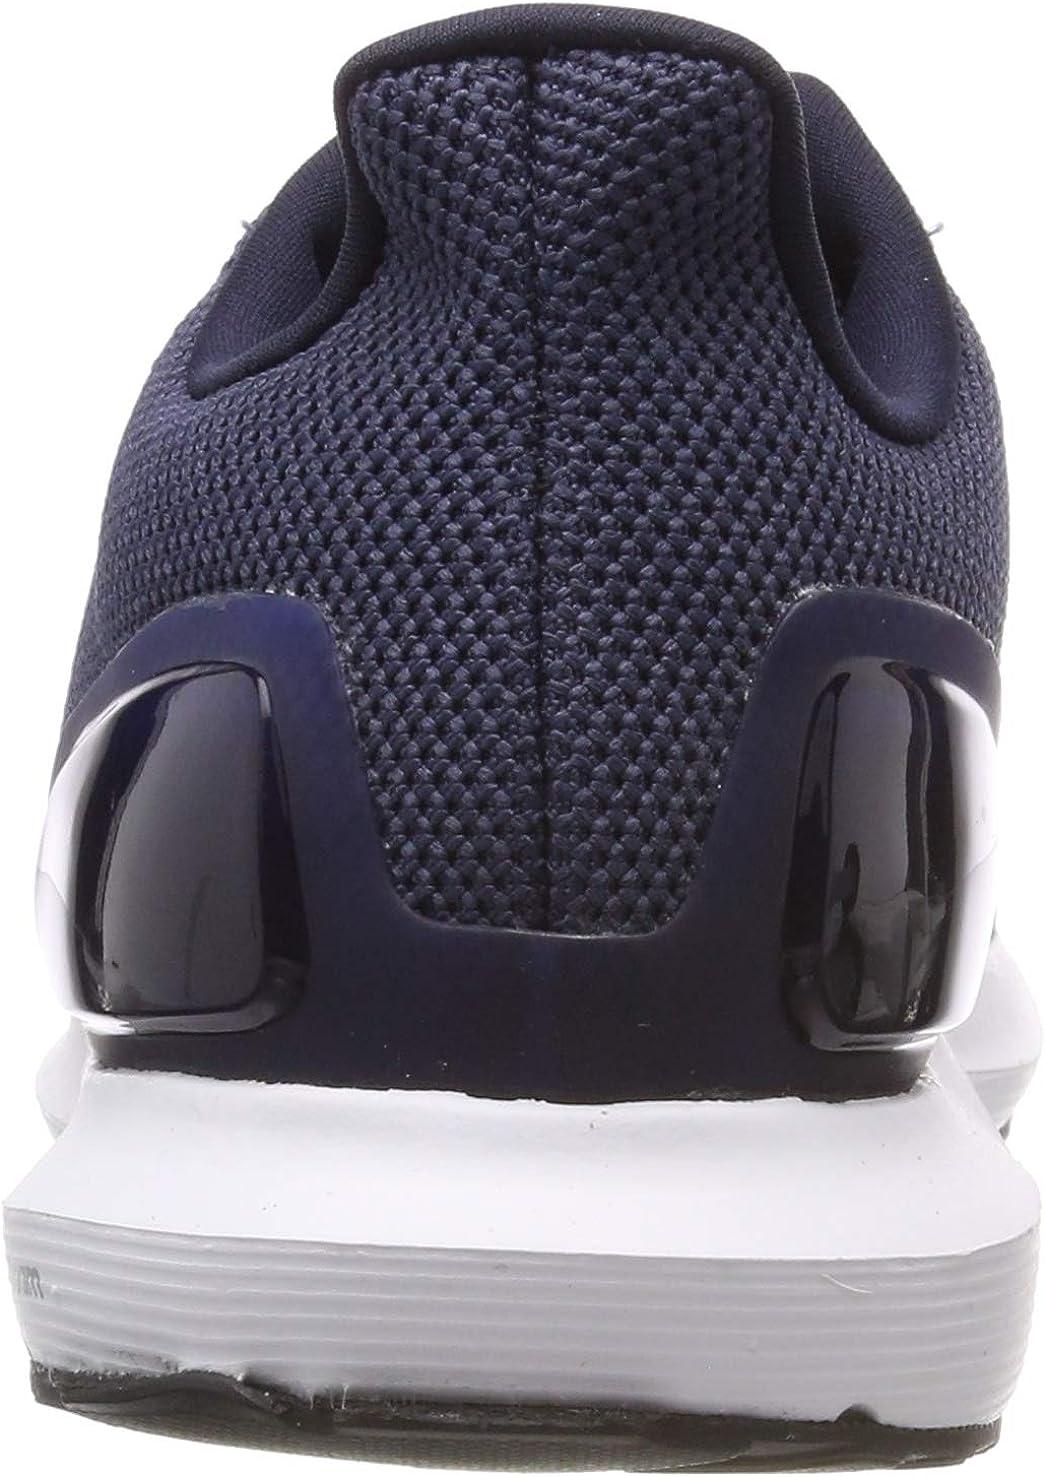 adidas Cosmic 2, Scarpe Running Uomo: MainApps: Amazon.it